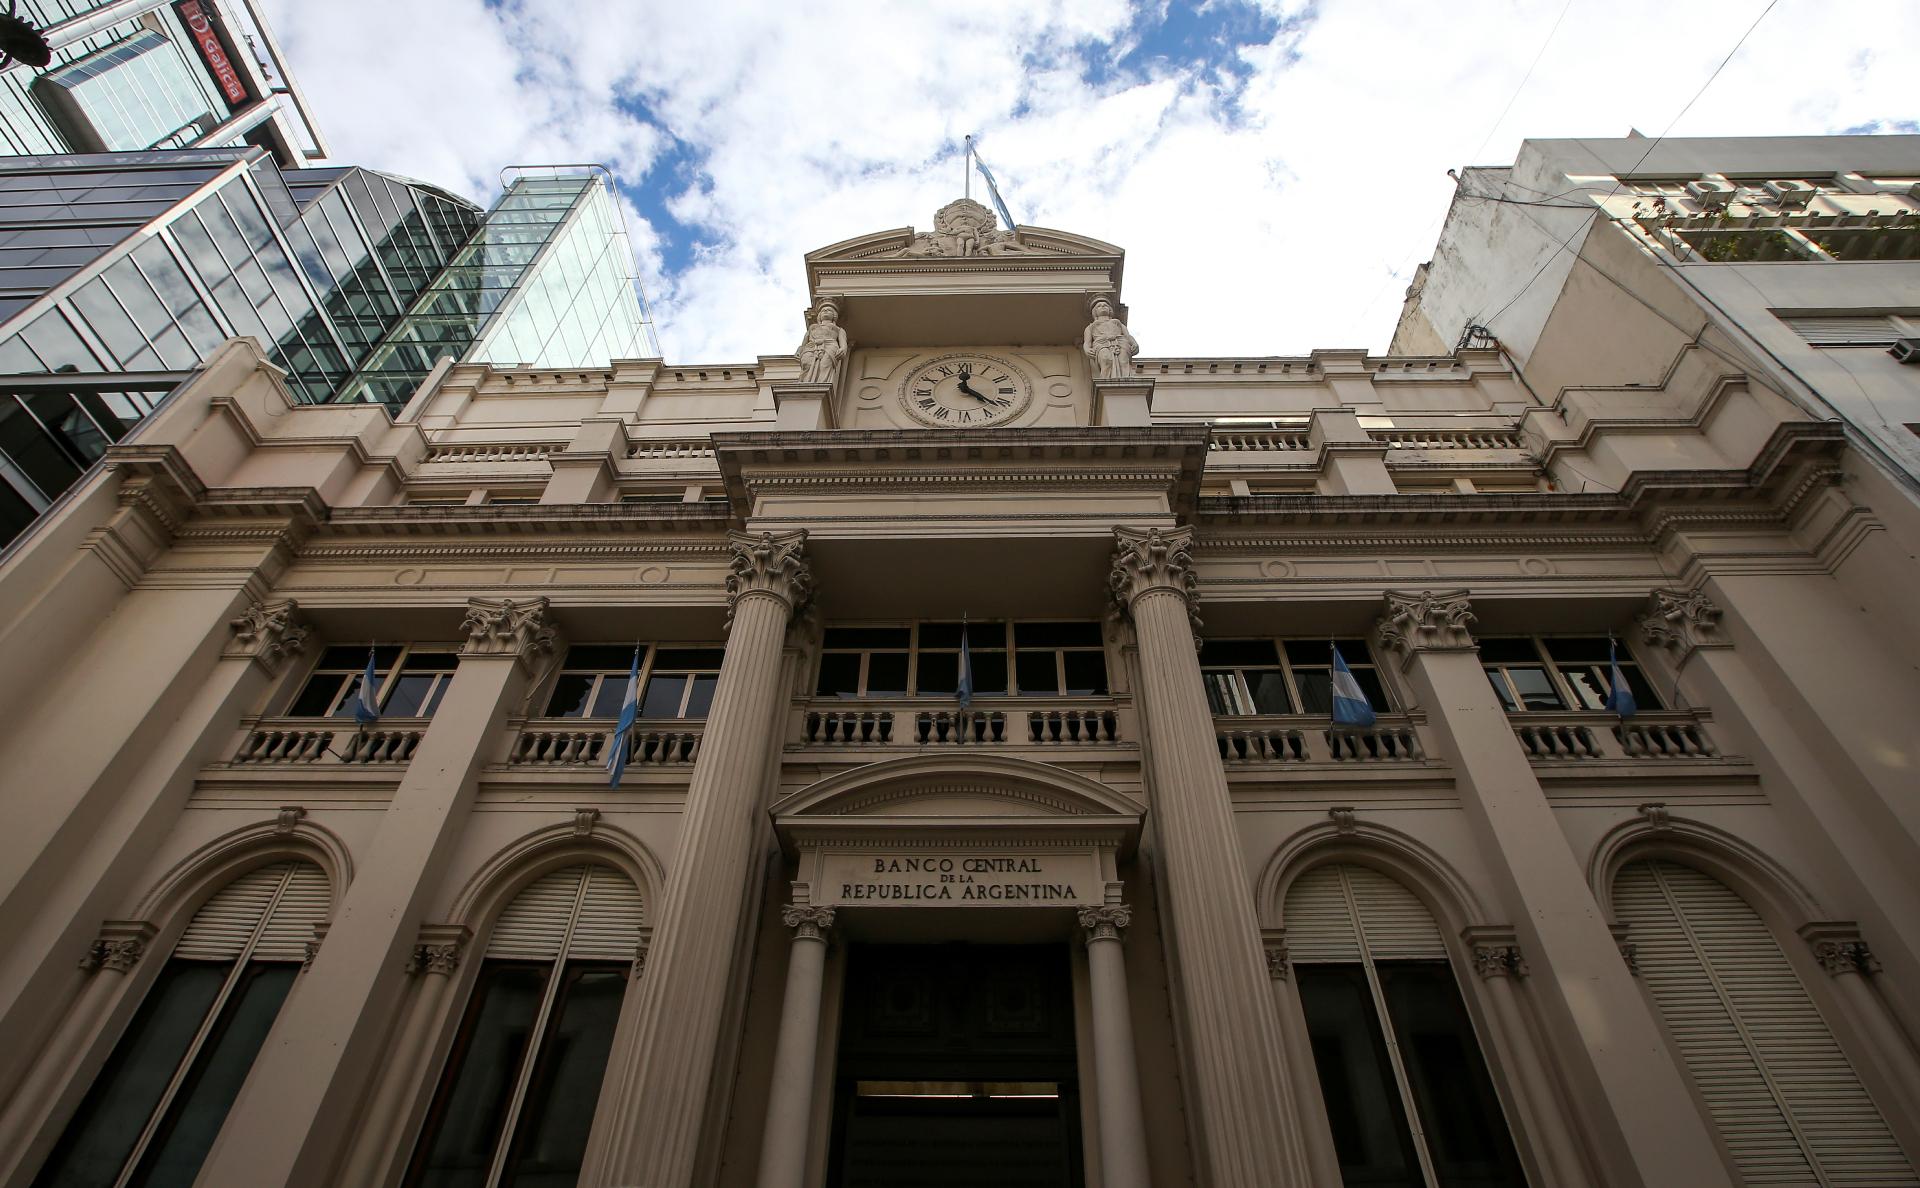 Центральный банк Аргентины